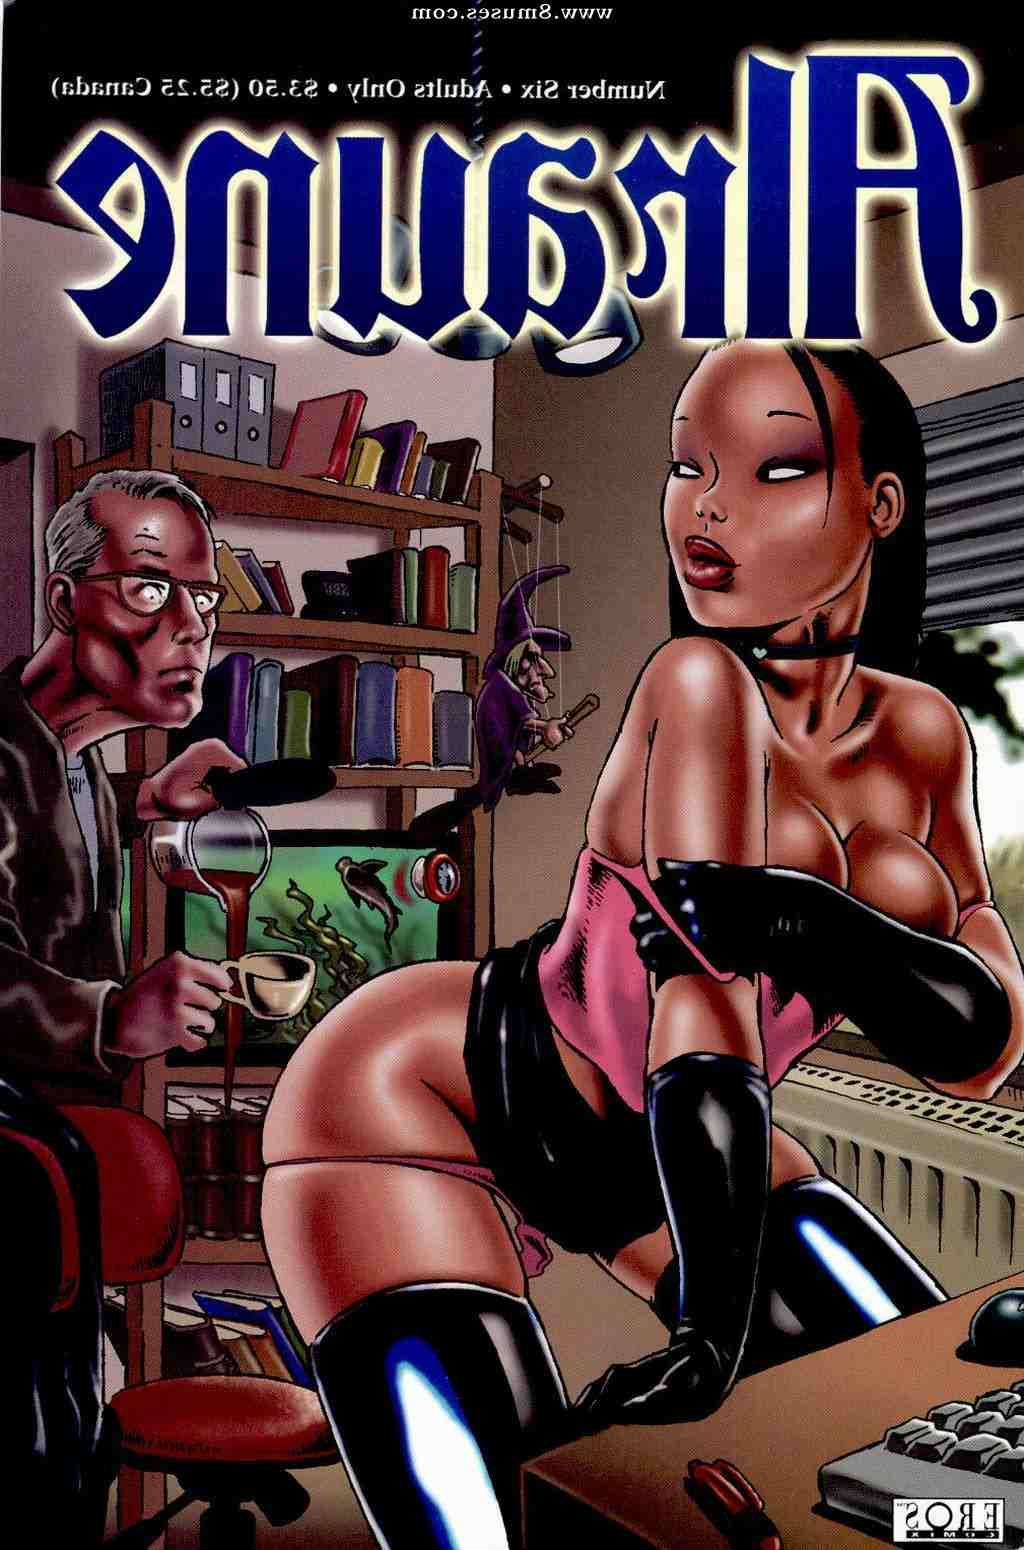 EROS-Comics/Alraune/Alraune-06 Alraune_06__8muses_-_Sex_and_Porn_Comics.jpg